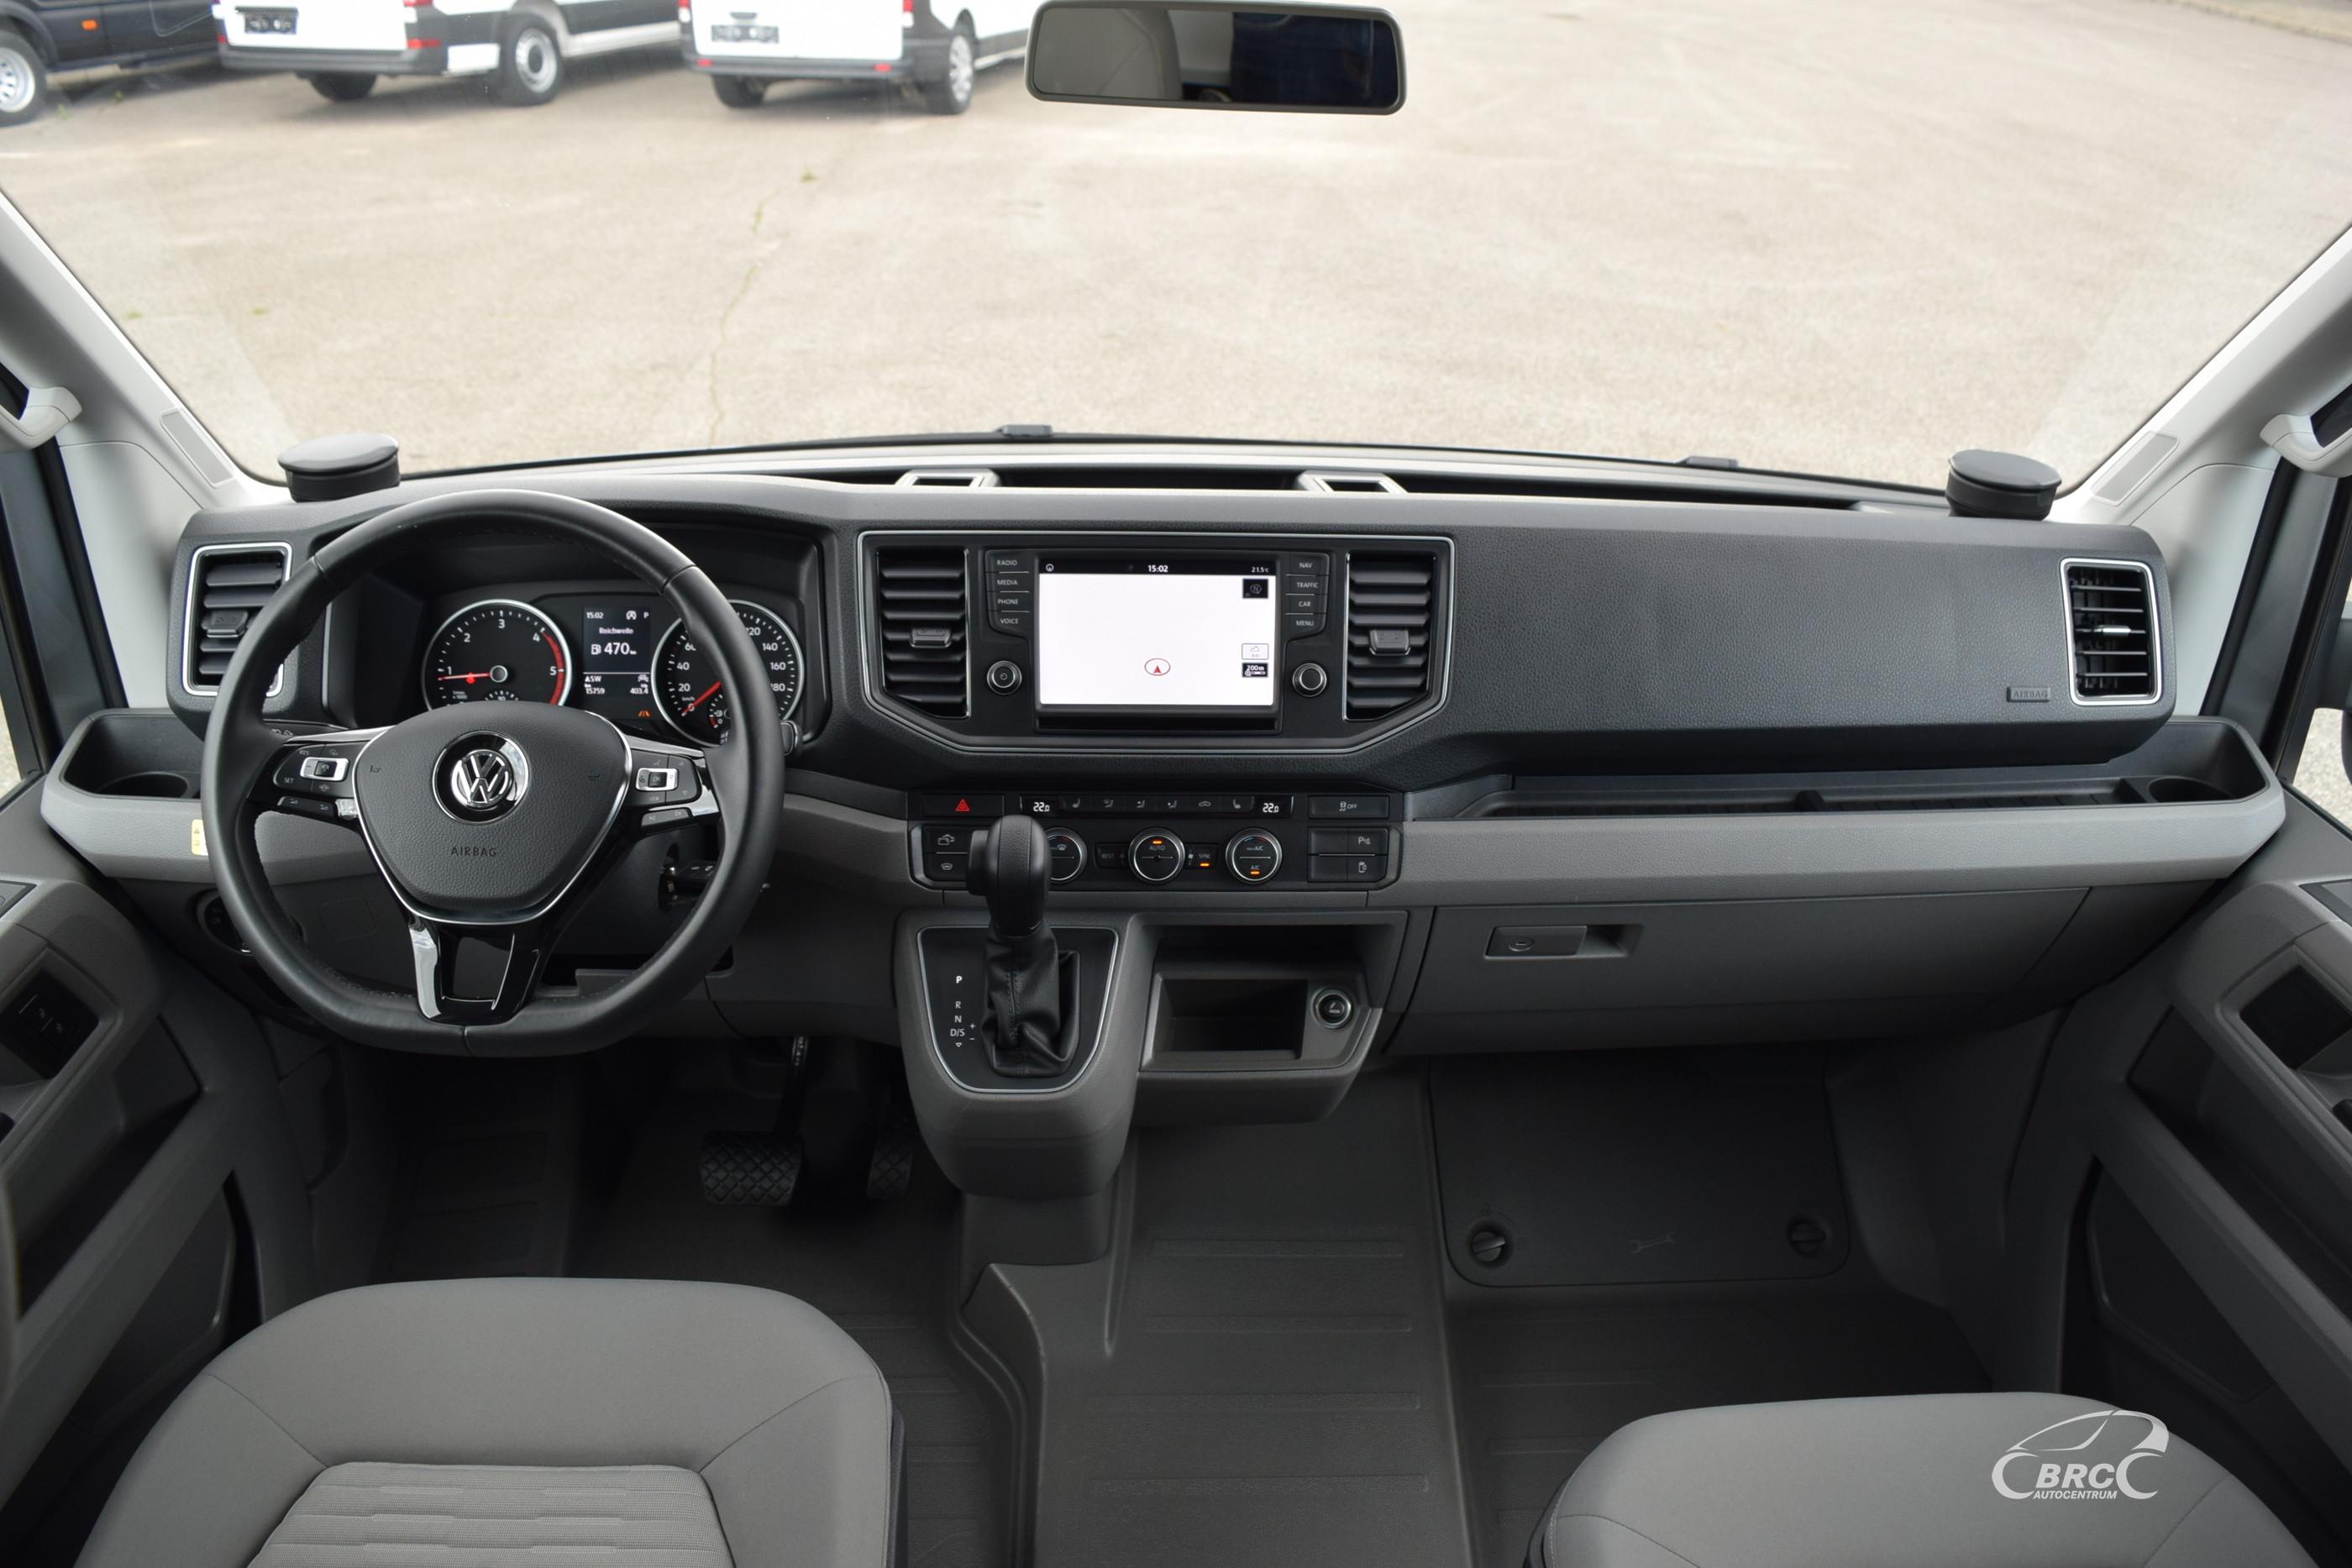 Volkswagen Crafter Grand California